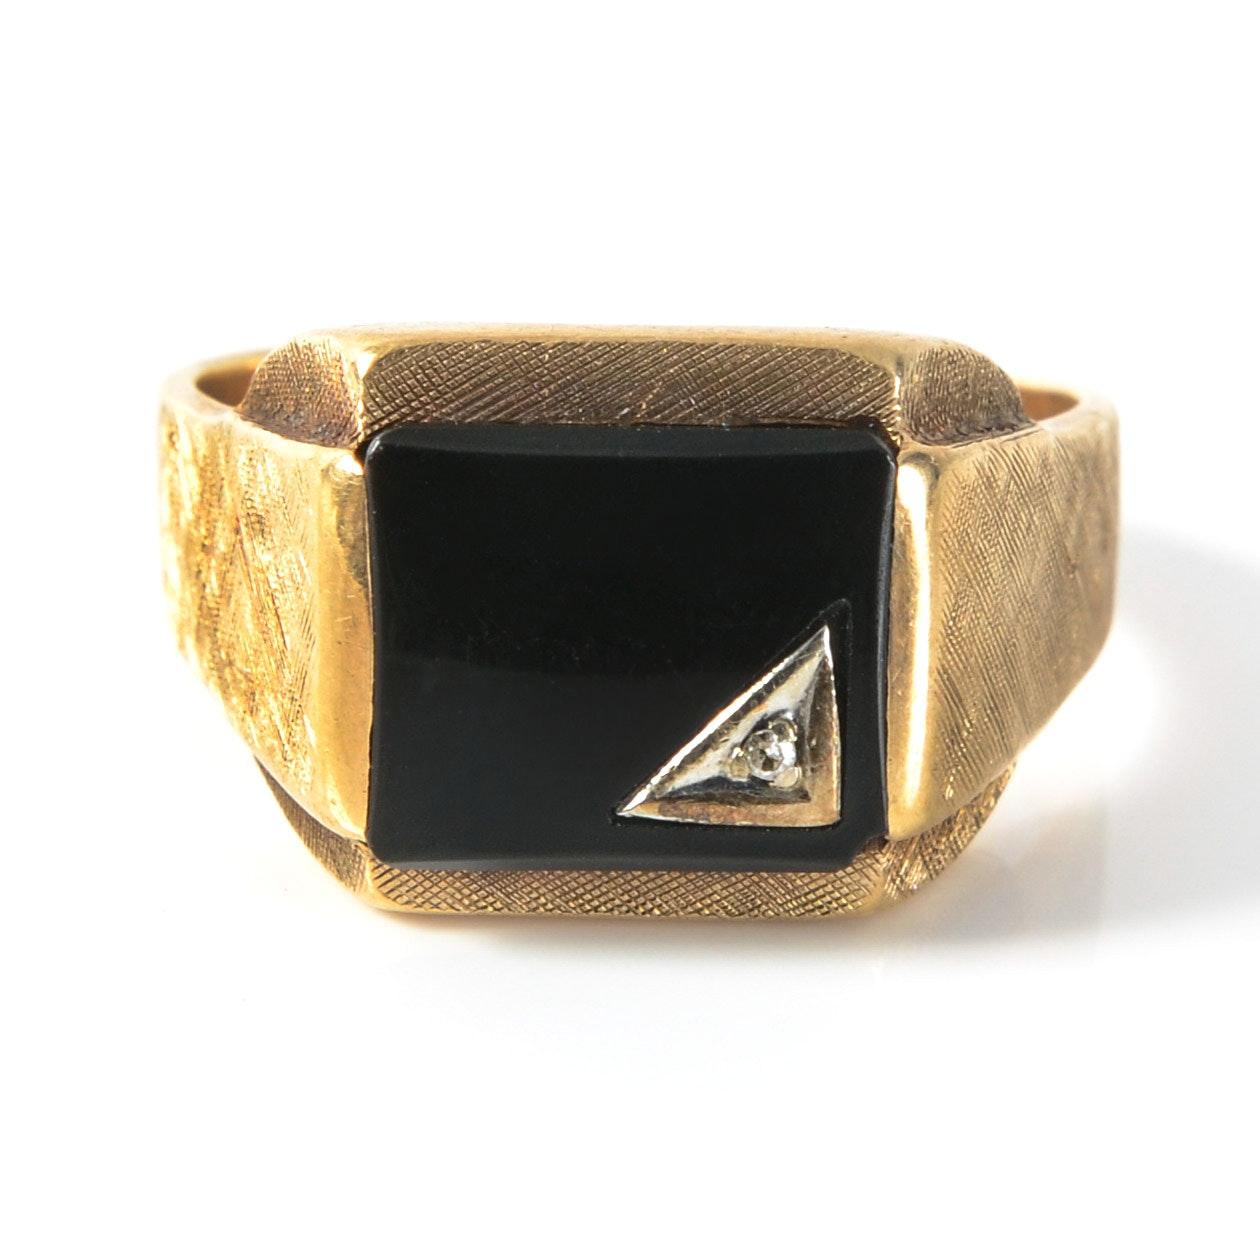 10K Gold, Onyx and Diamond Ring